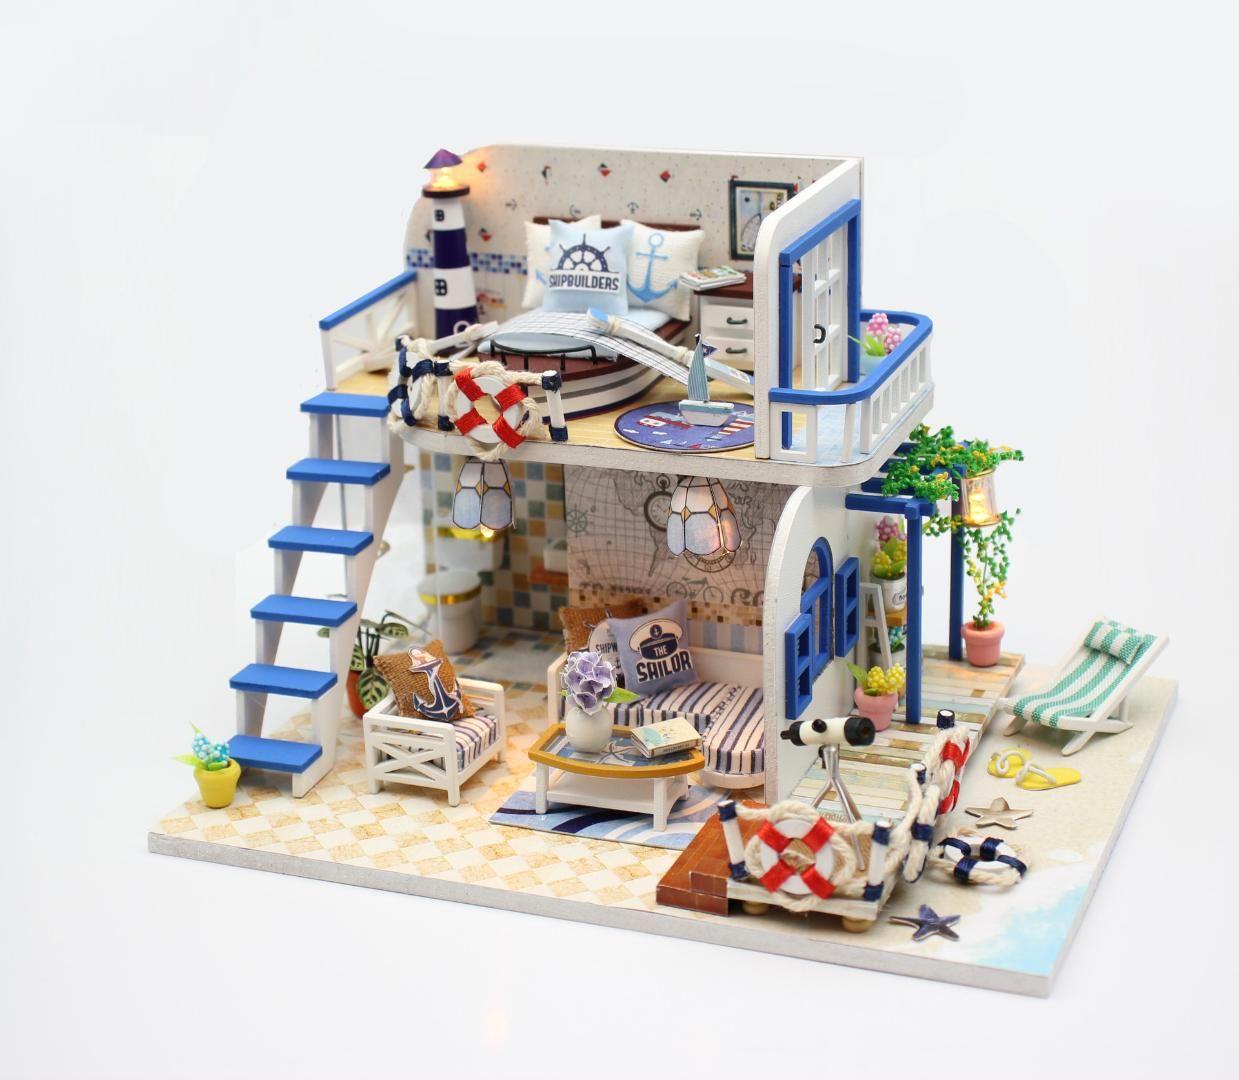 Diy Seaside Villa Mini Dollhouse With Miniature Furniture Dust Cover